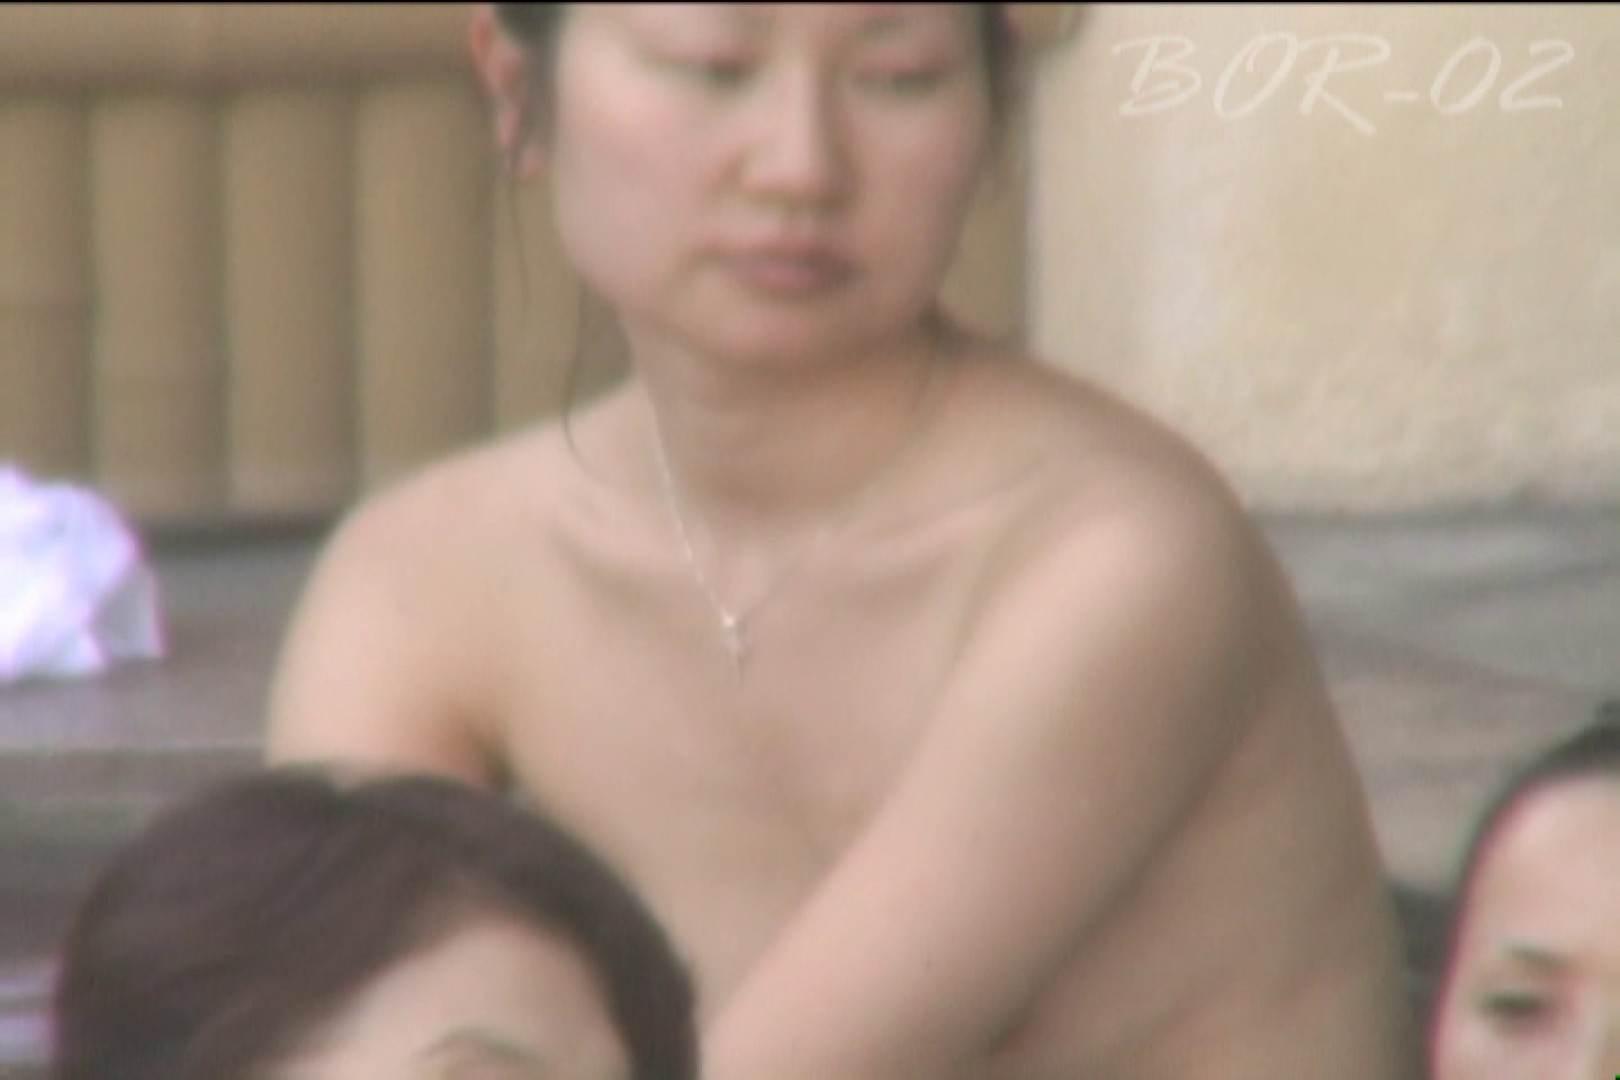 Aquaな露天風呂Vol.477 盗撮  79連発 78